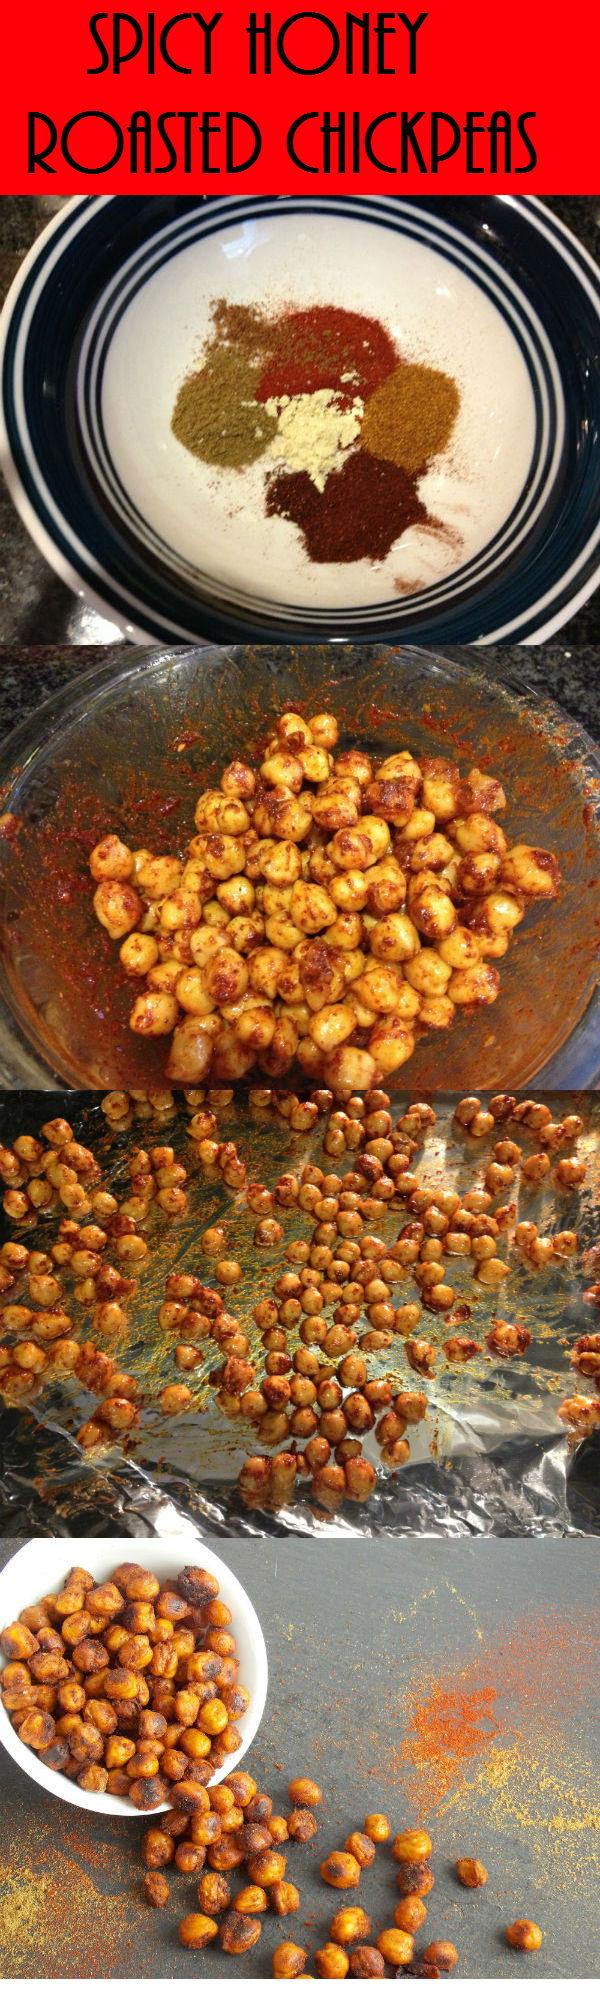 Spicy Honey Roasted Chickpeas - My Clean Kitchen